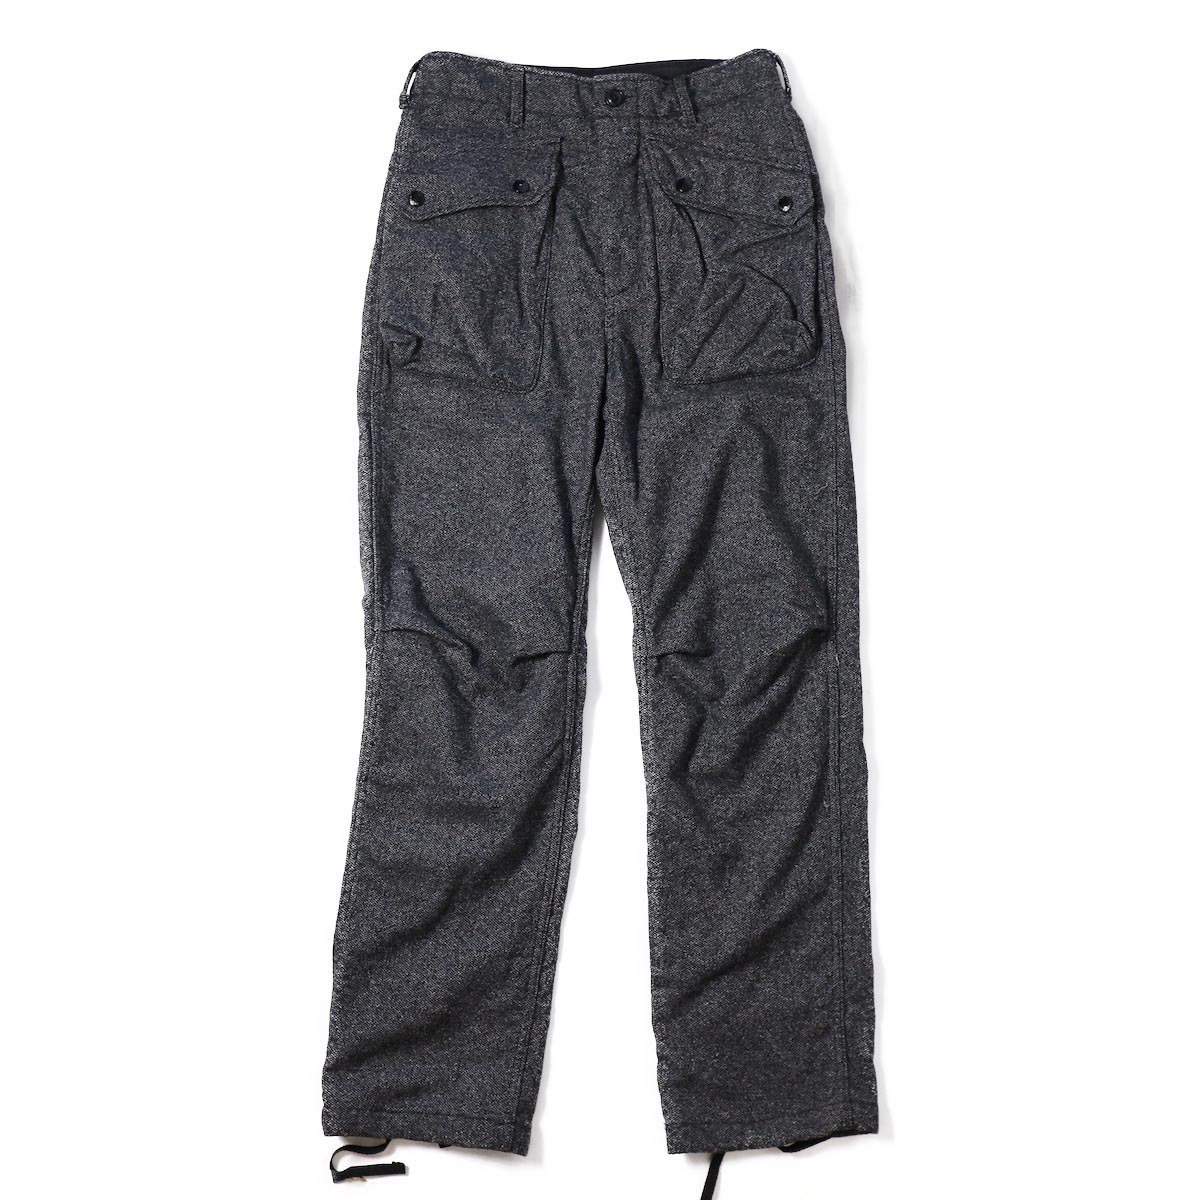 ENGINEERED GARMENTS / Norwegian Pant Wool Homespun -Grey